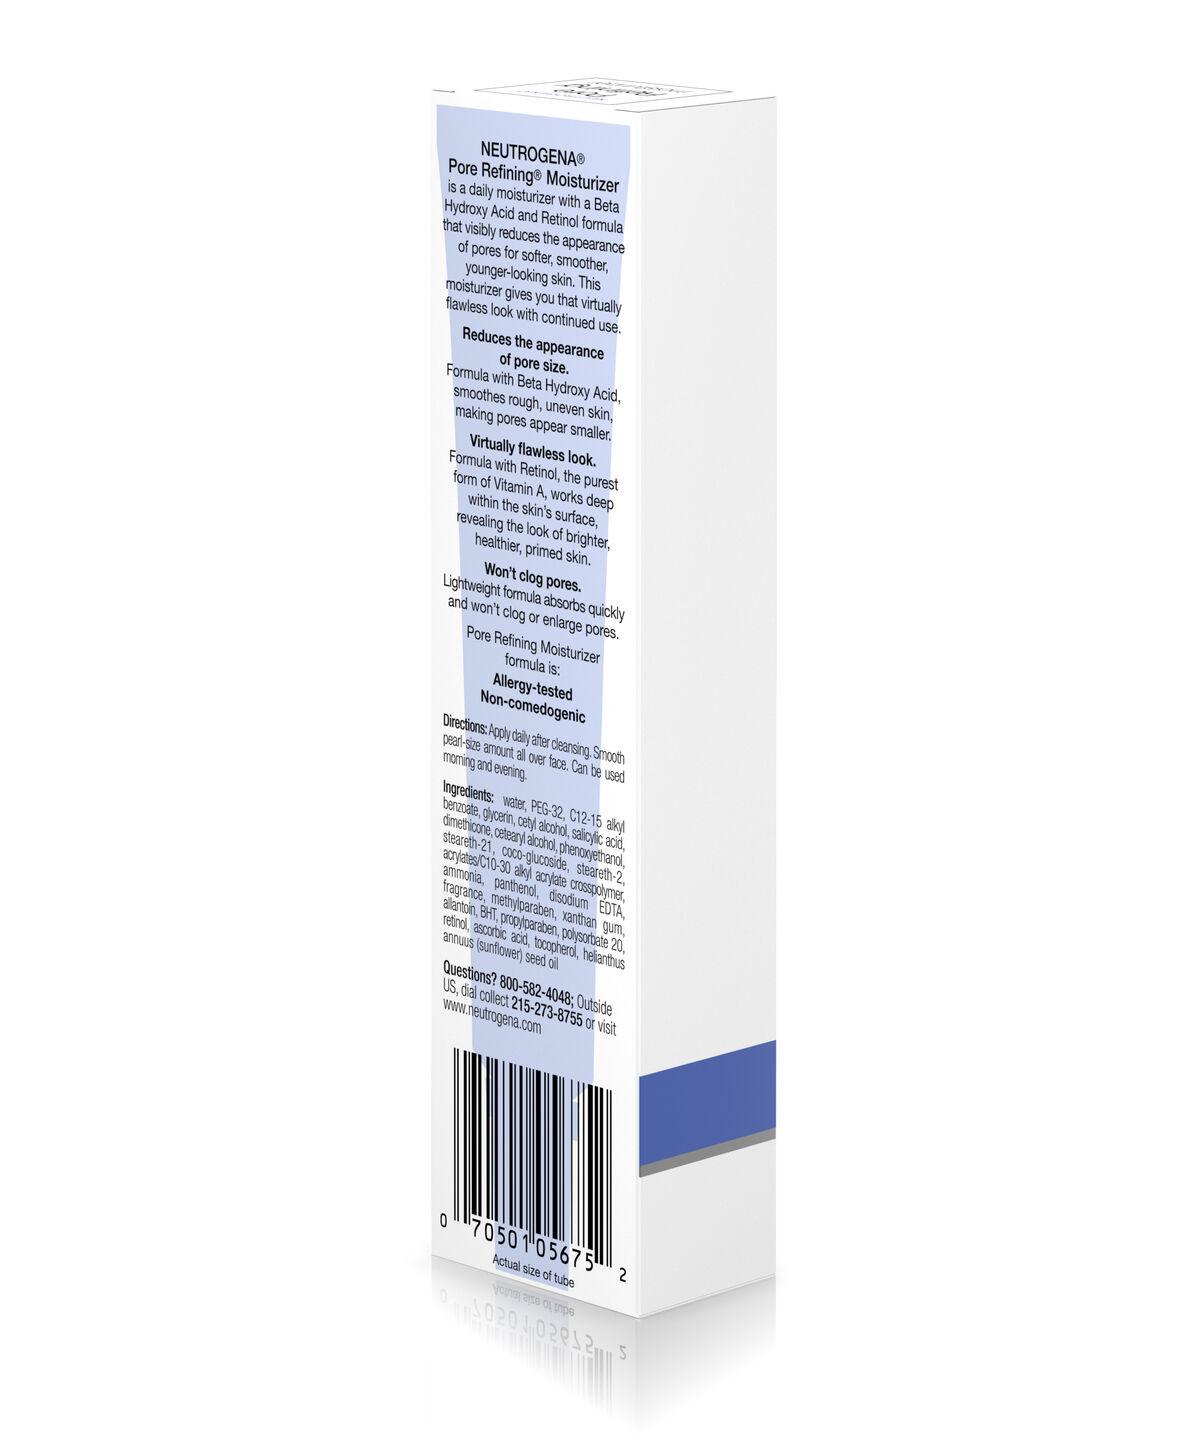 Retinol amounts in moisturizers -  Pore Refining Moisturizer